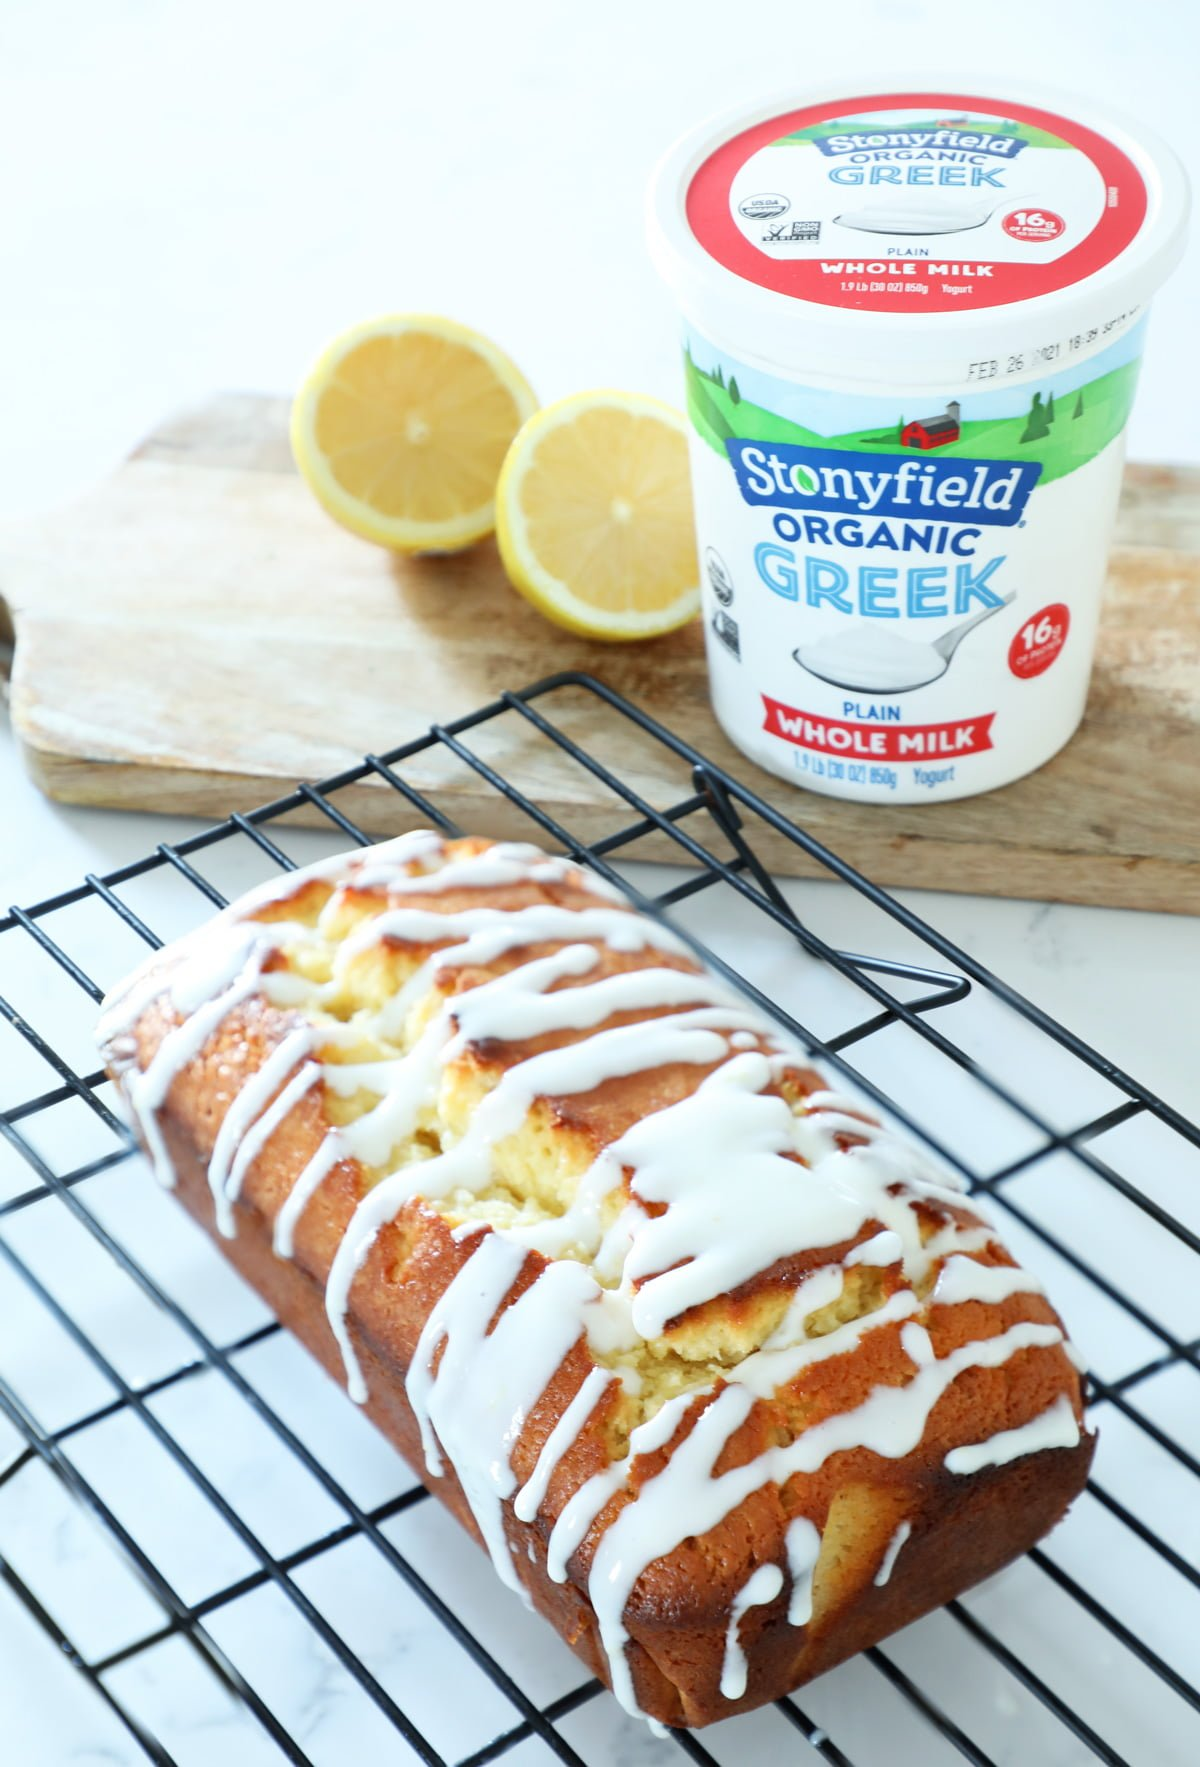 Lemon Pound Cake with yogurt